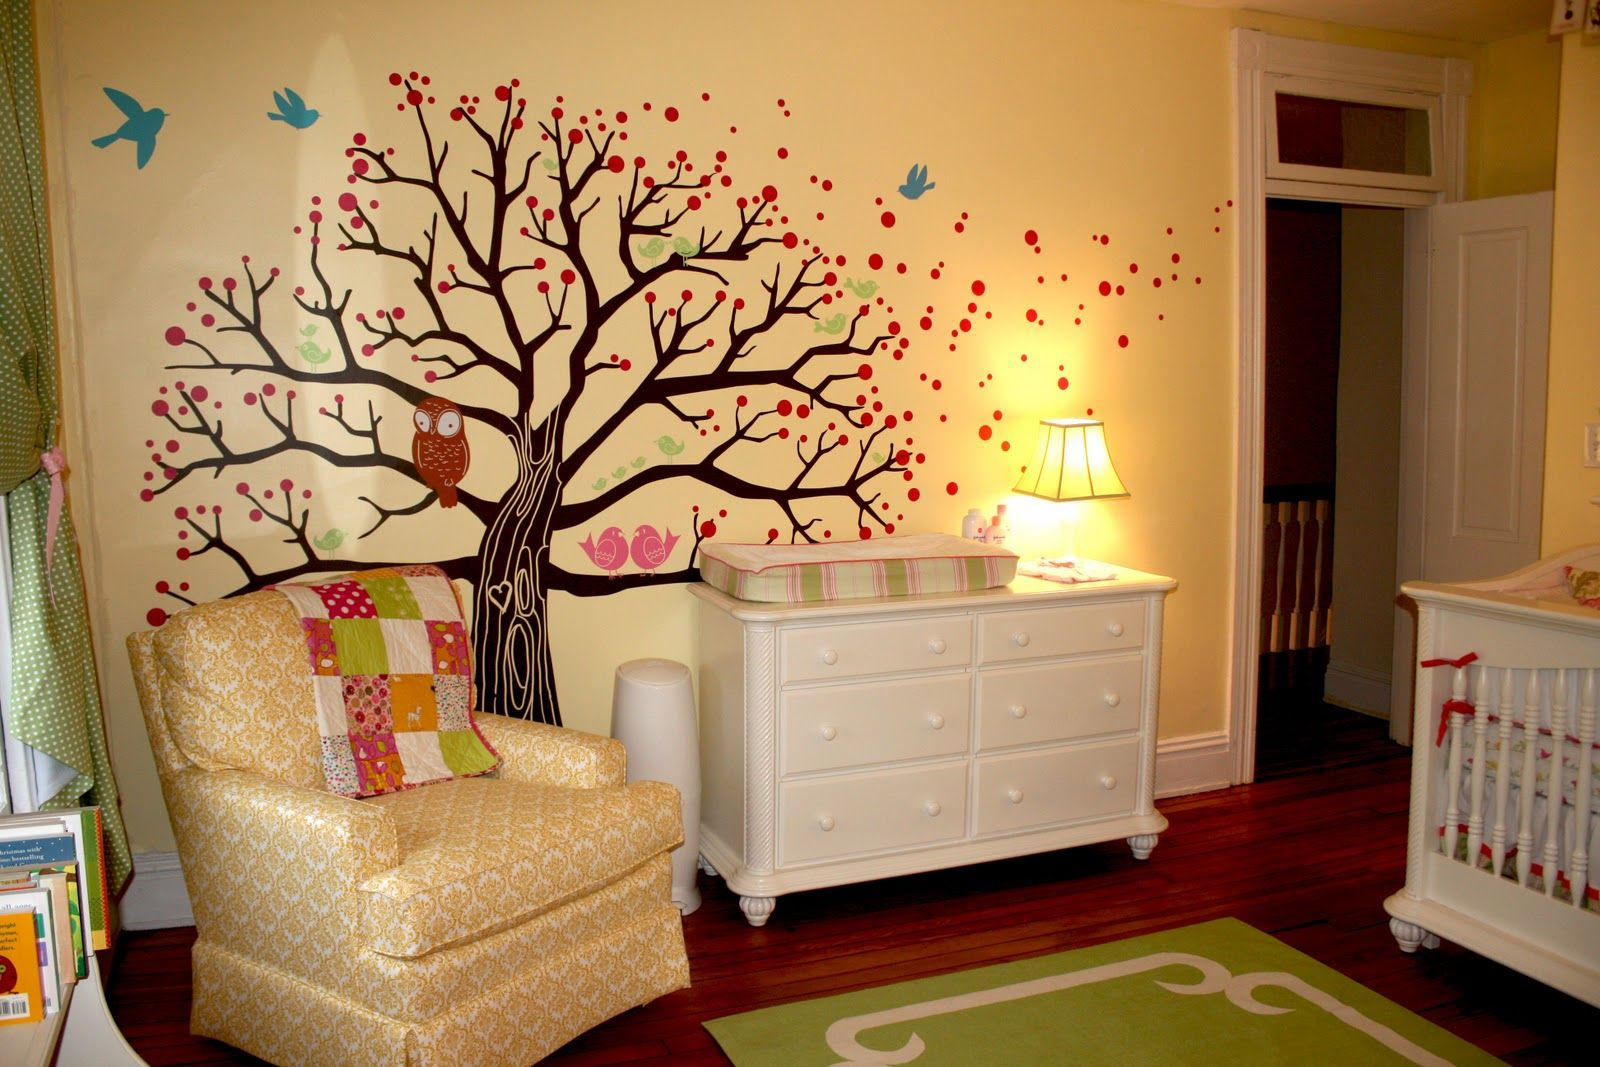 nurseries the tree and nursery design on pinterest bedroom cool bedroom wallpaper baby nursery